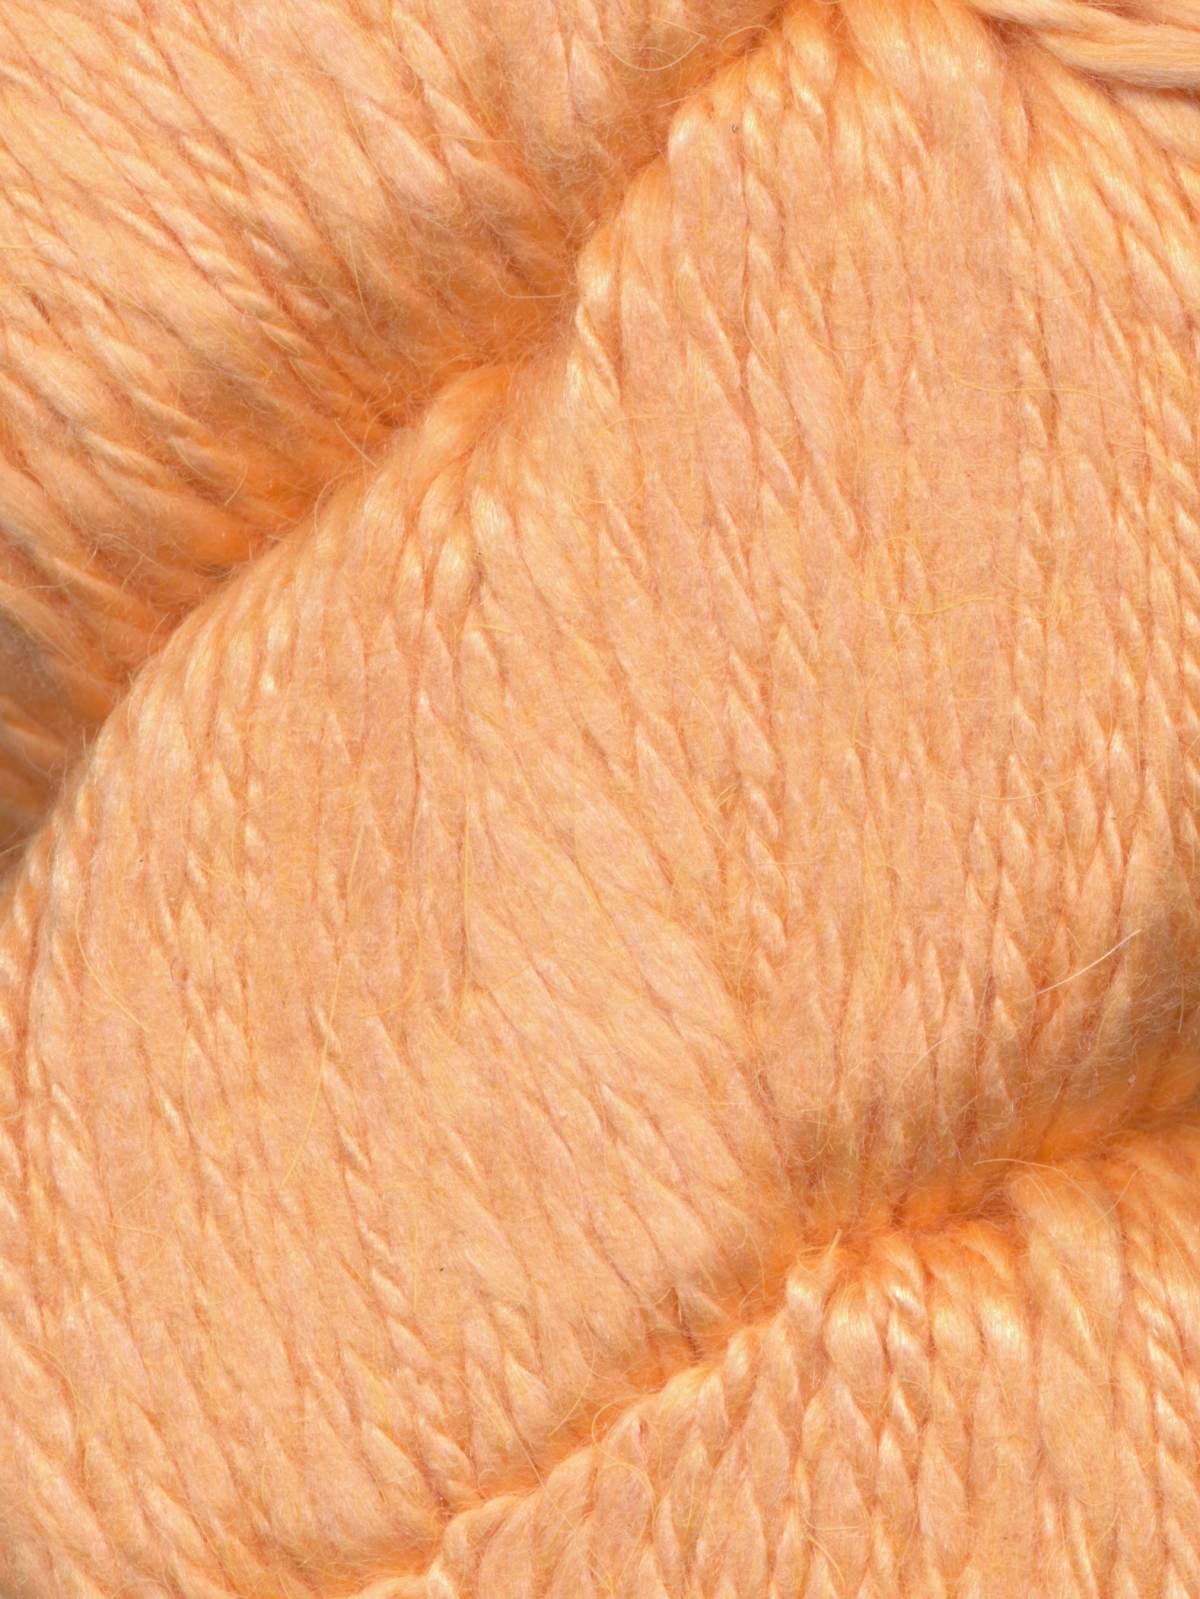 Queensland Tide Cointreau